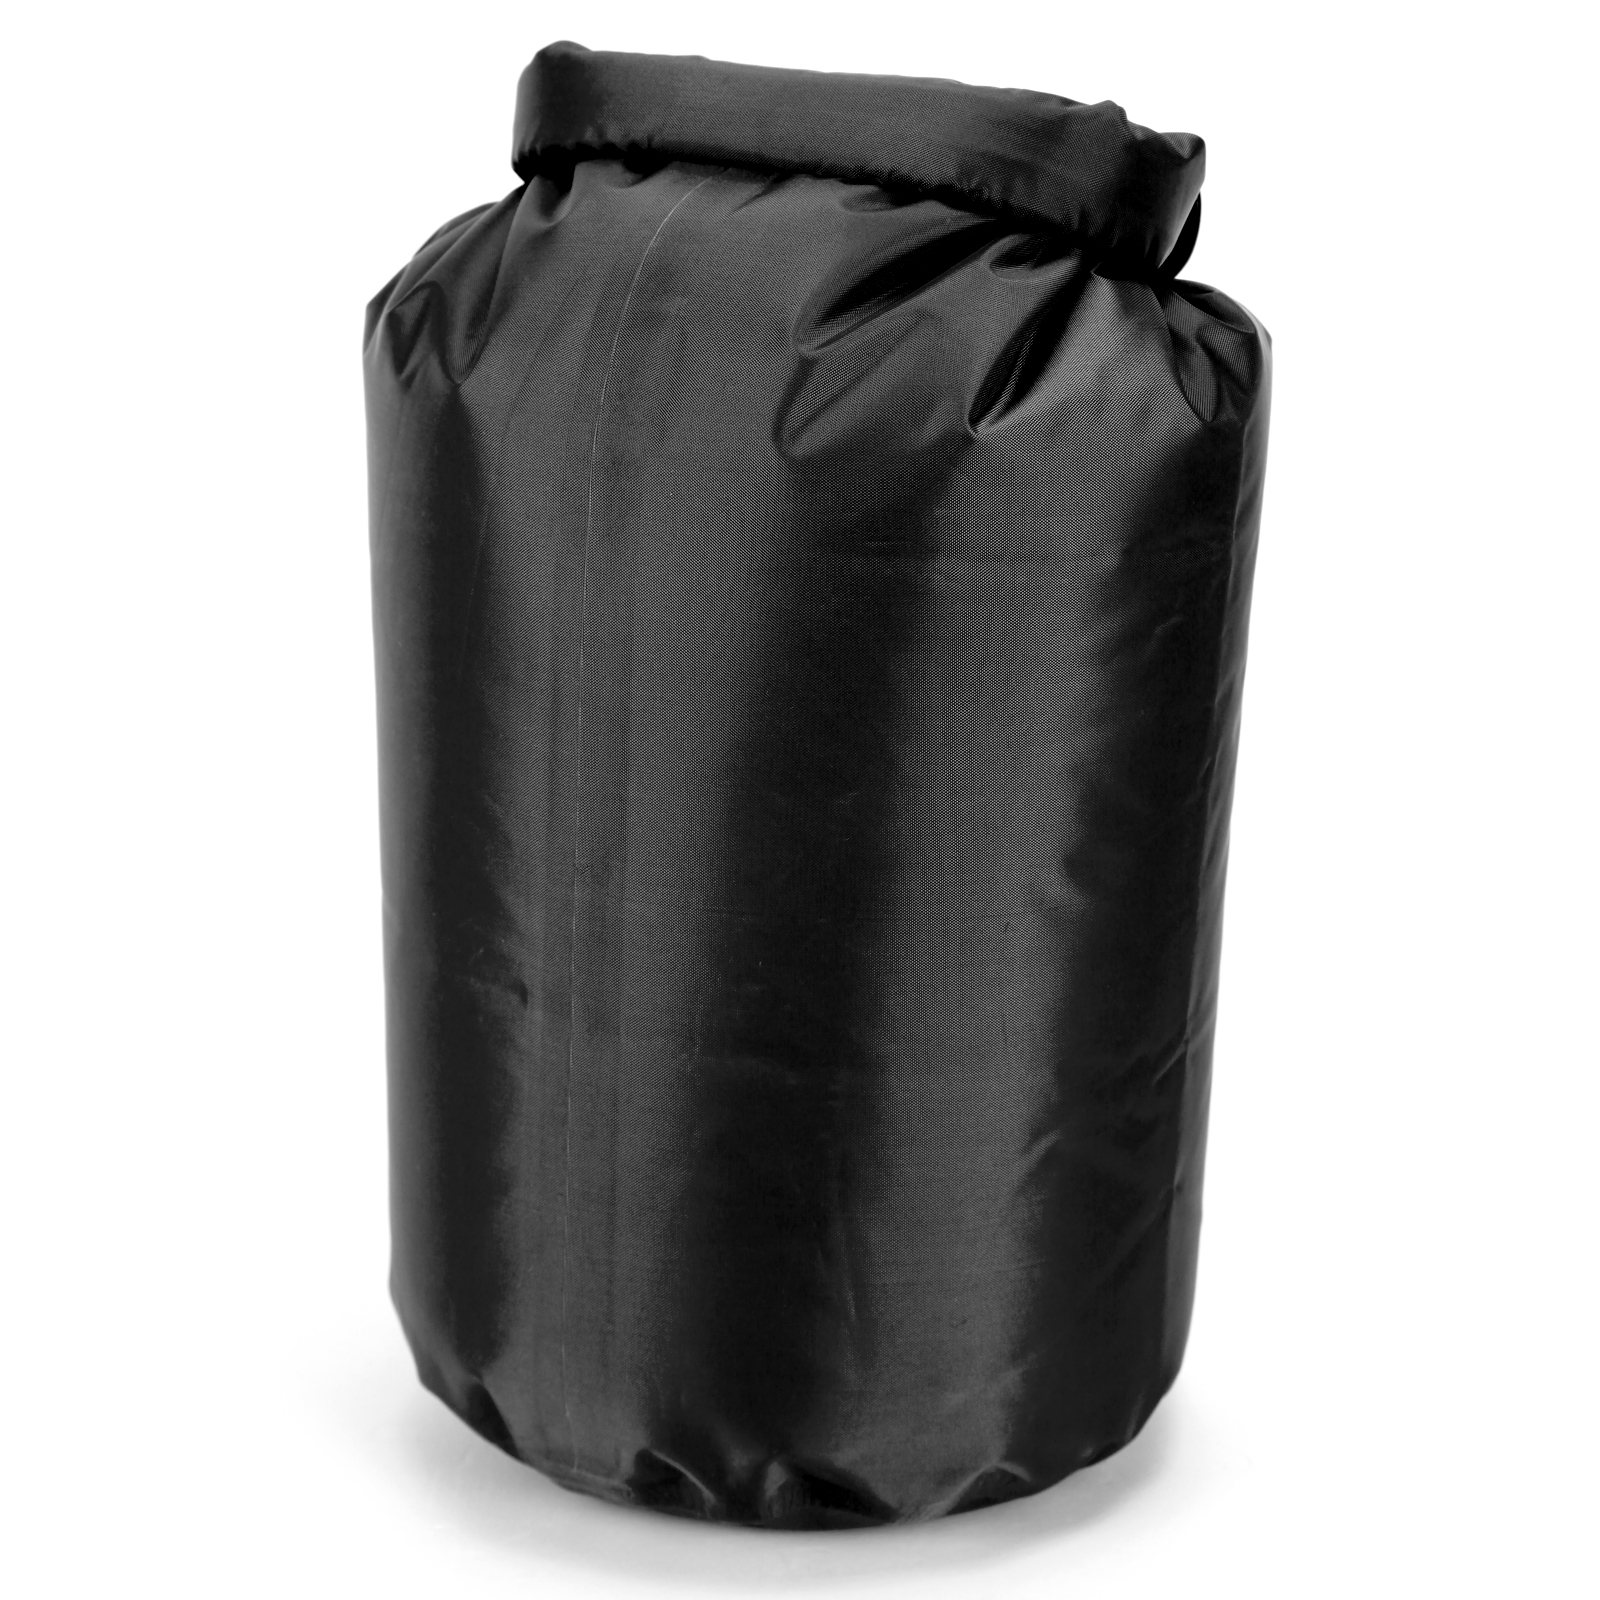 wasserdicht transportsack schwarz wasserdicht gep ckrolle motorrad camping ebay. Black Bedroom Furniture Sets. Home Design Ideas